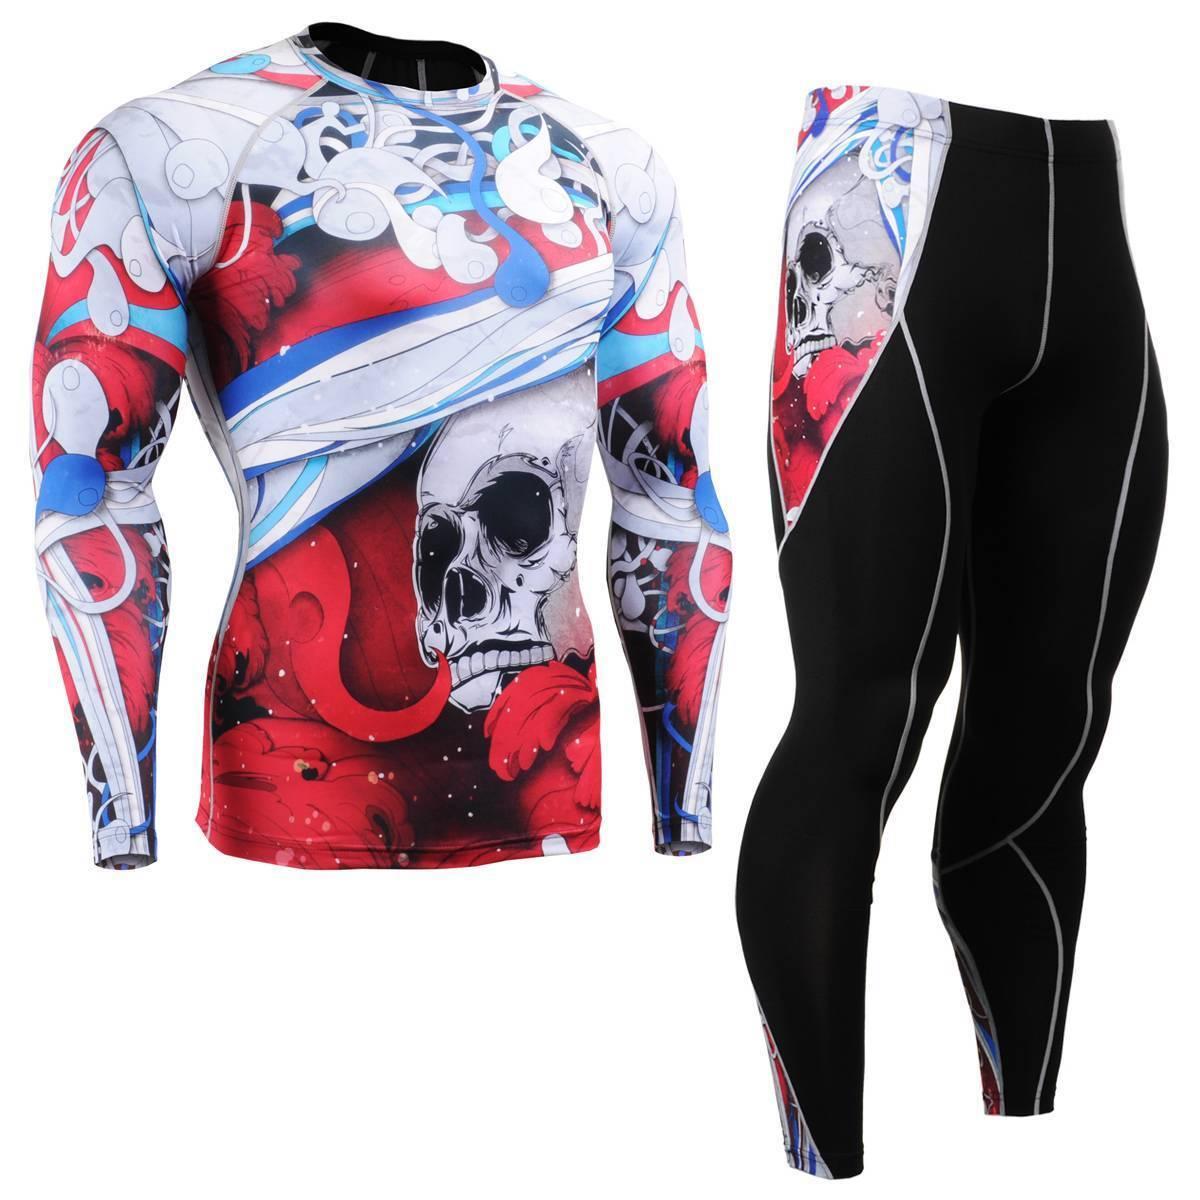 FIXGEAR CFL/P2L-B19R SET Compression Shirts & Pants Gym Skin Tights MMA Training Gym Pants 7fb0b8